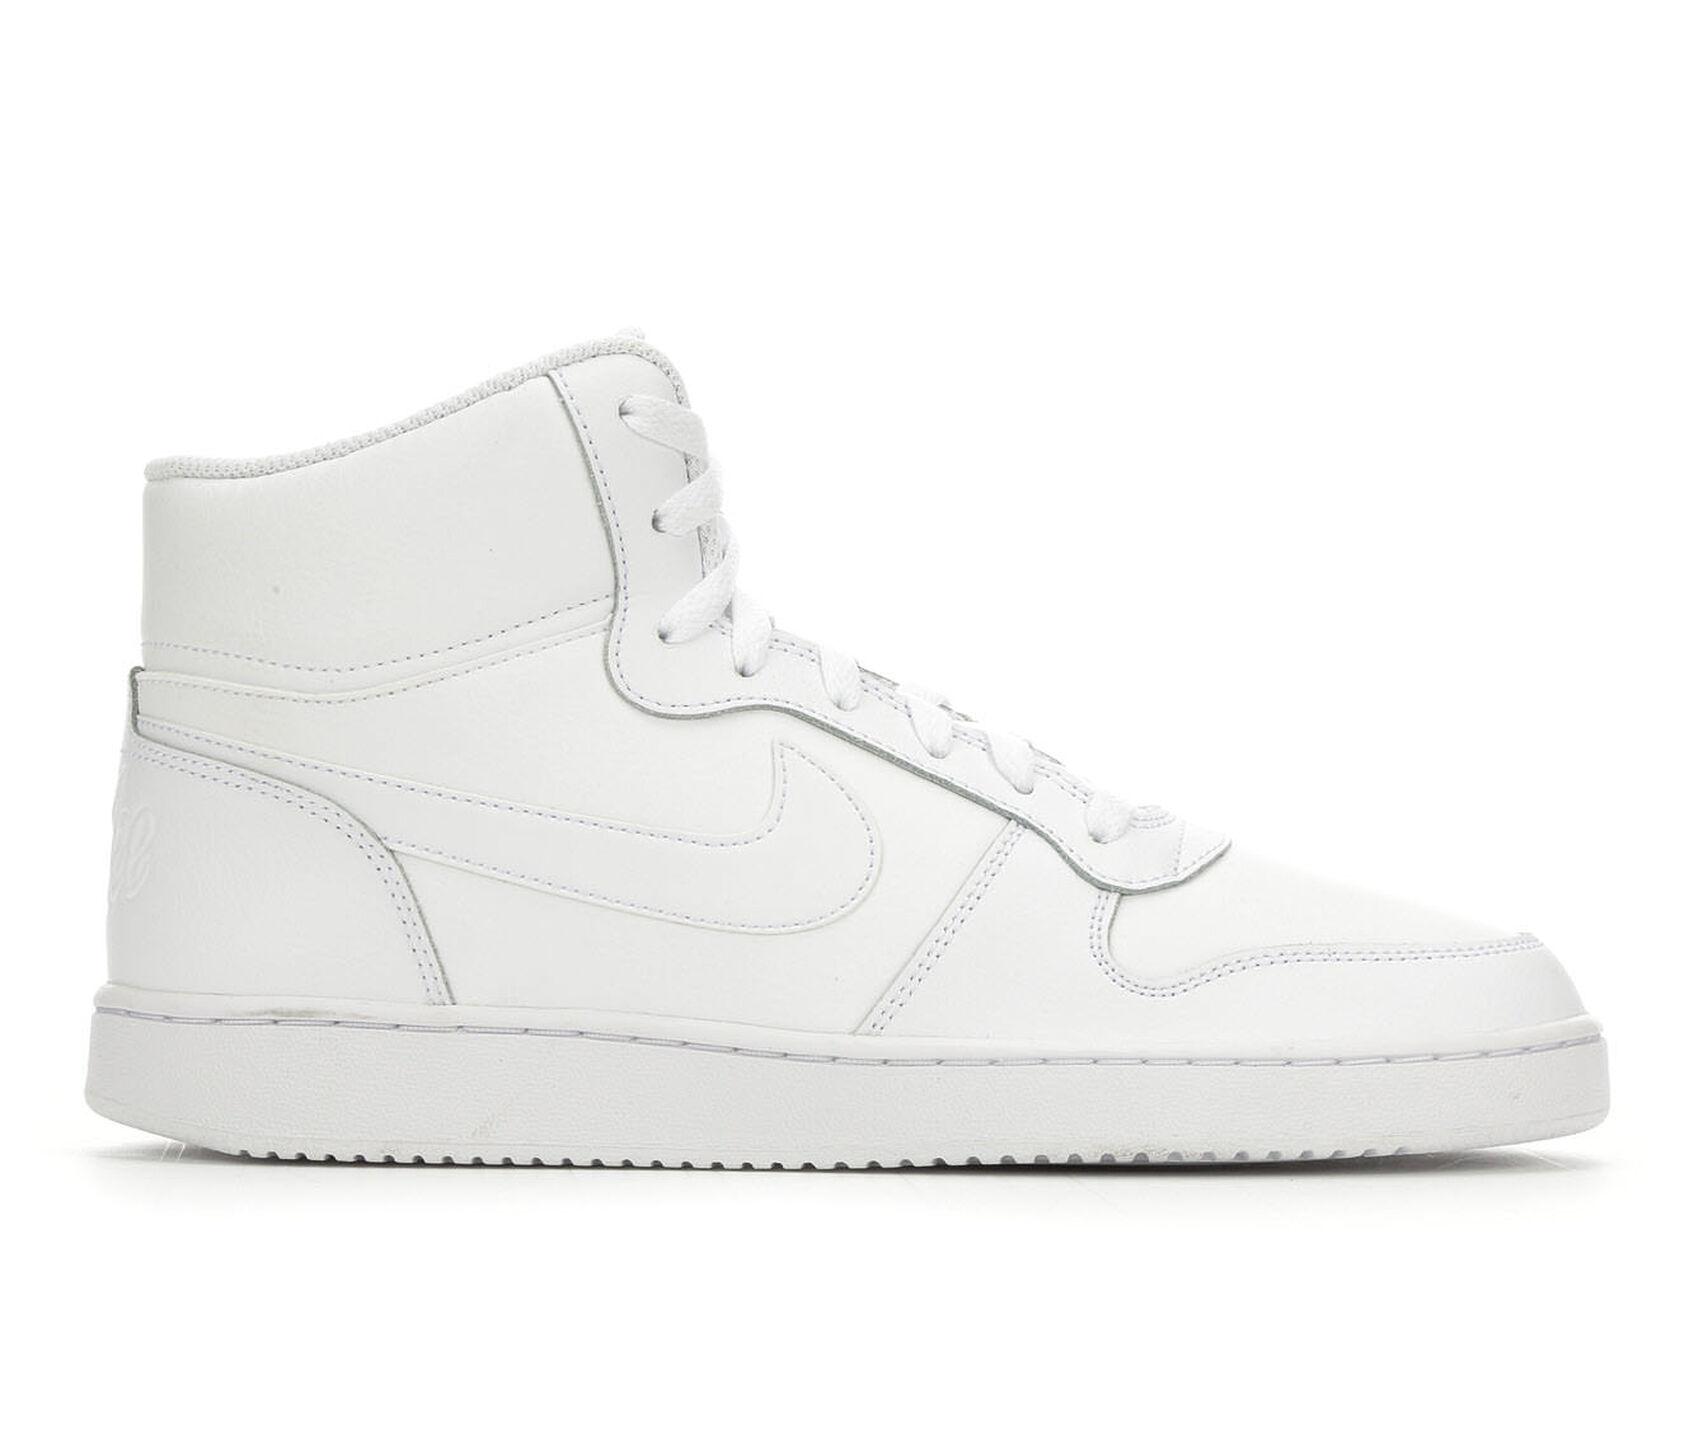 6a716f8ca1 ... Nike Ebernon Mid Sneakers. Carousel Controls